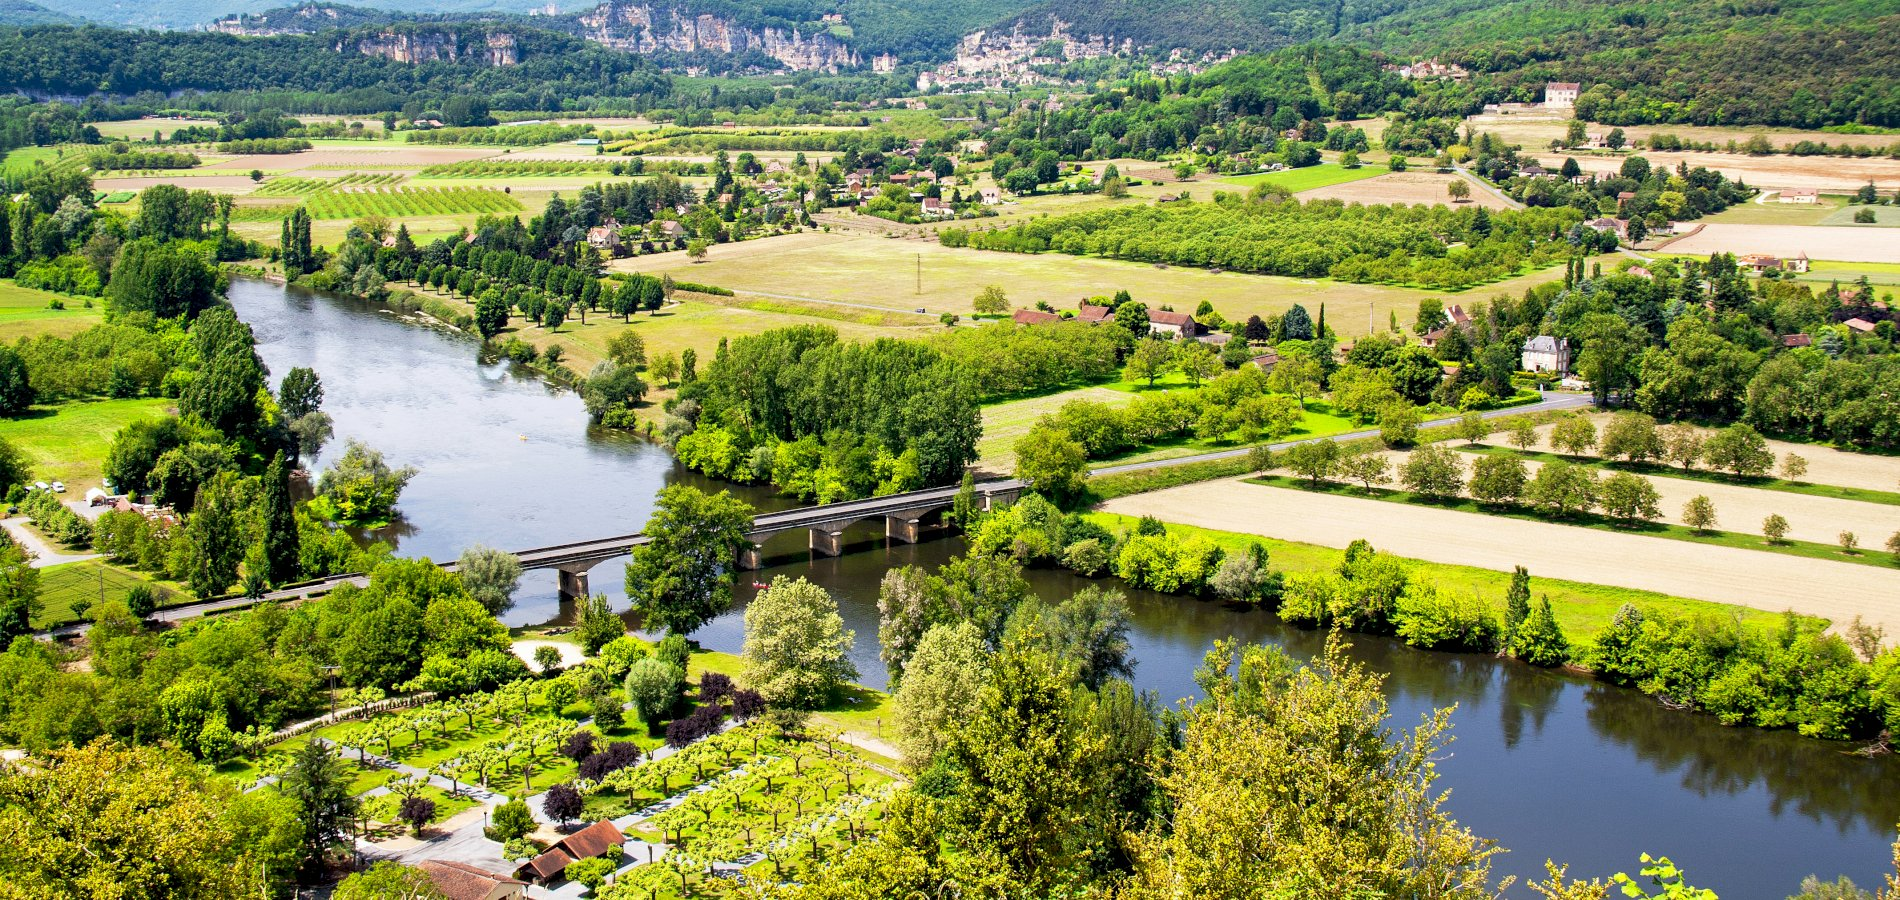 Ophorus Tours - 5 Days Dordogne Shared Travel Package - 3* Hotel Option